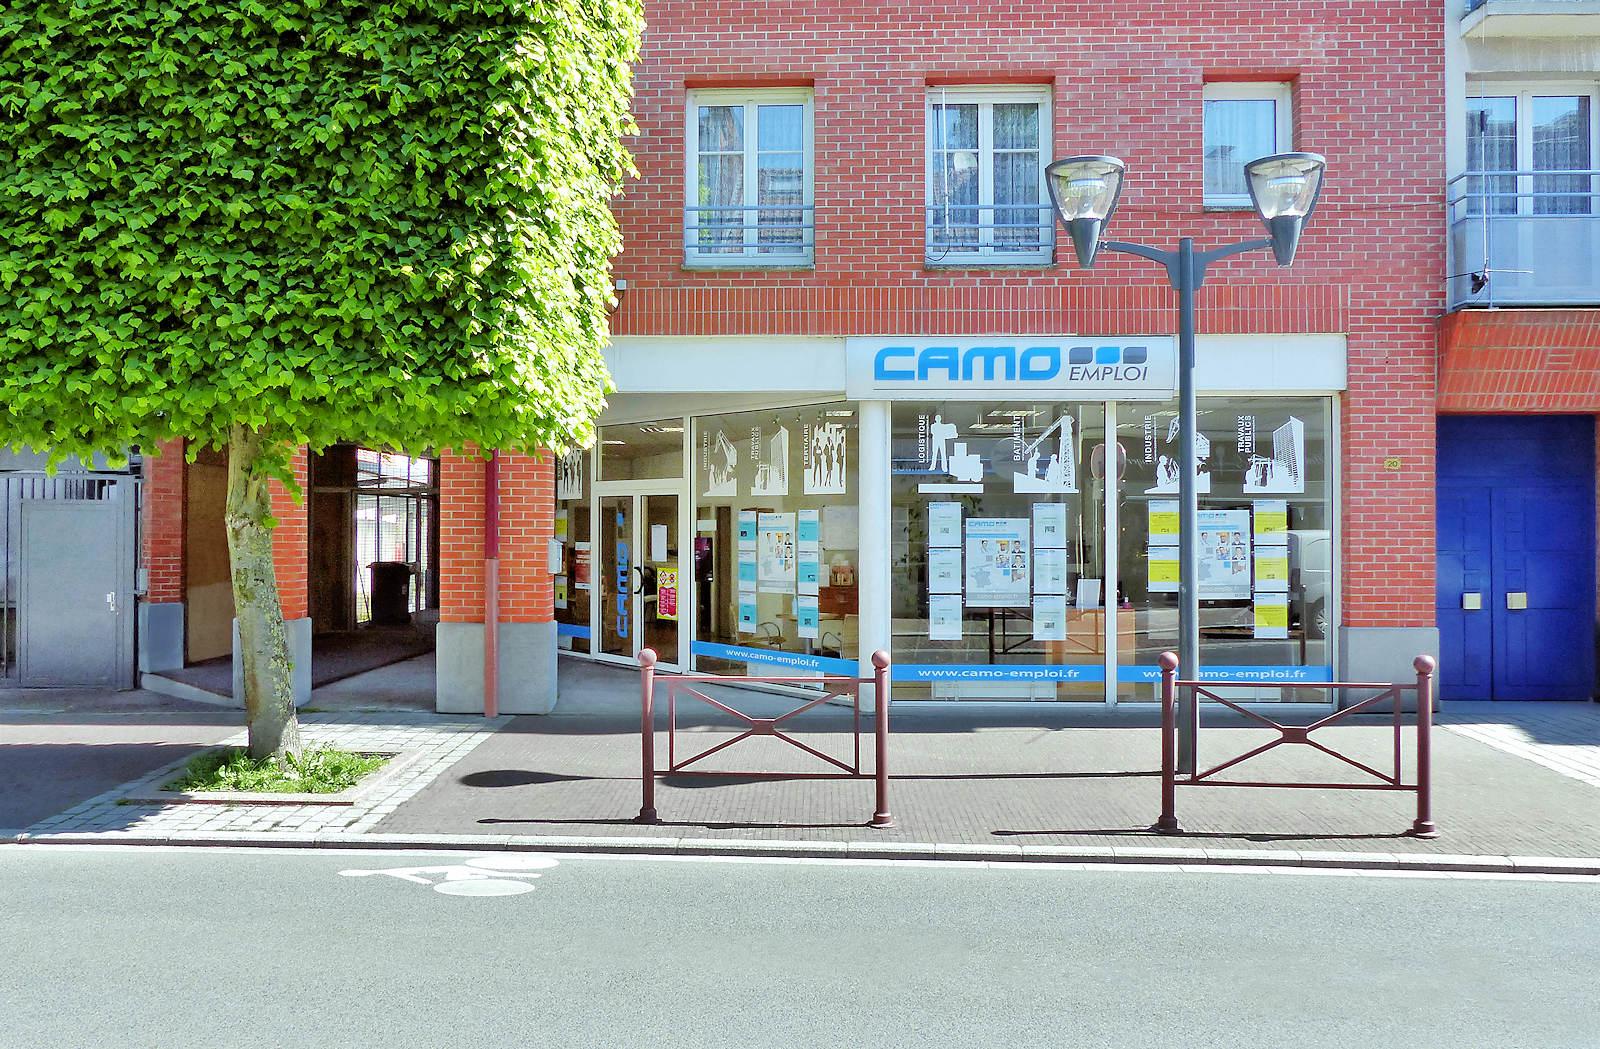 CAMO Emploi - Tourcoing, Rue de la Cloche.